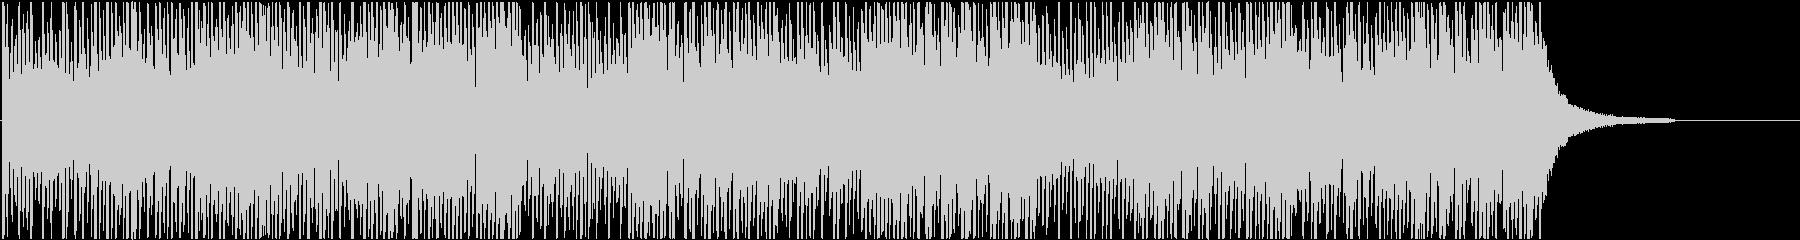 News7 16bit44kHzVerの未再生の波形